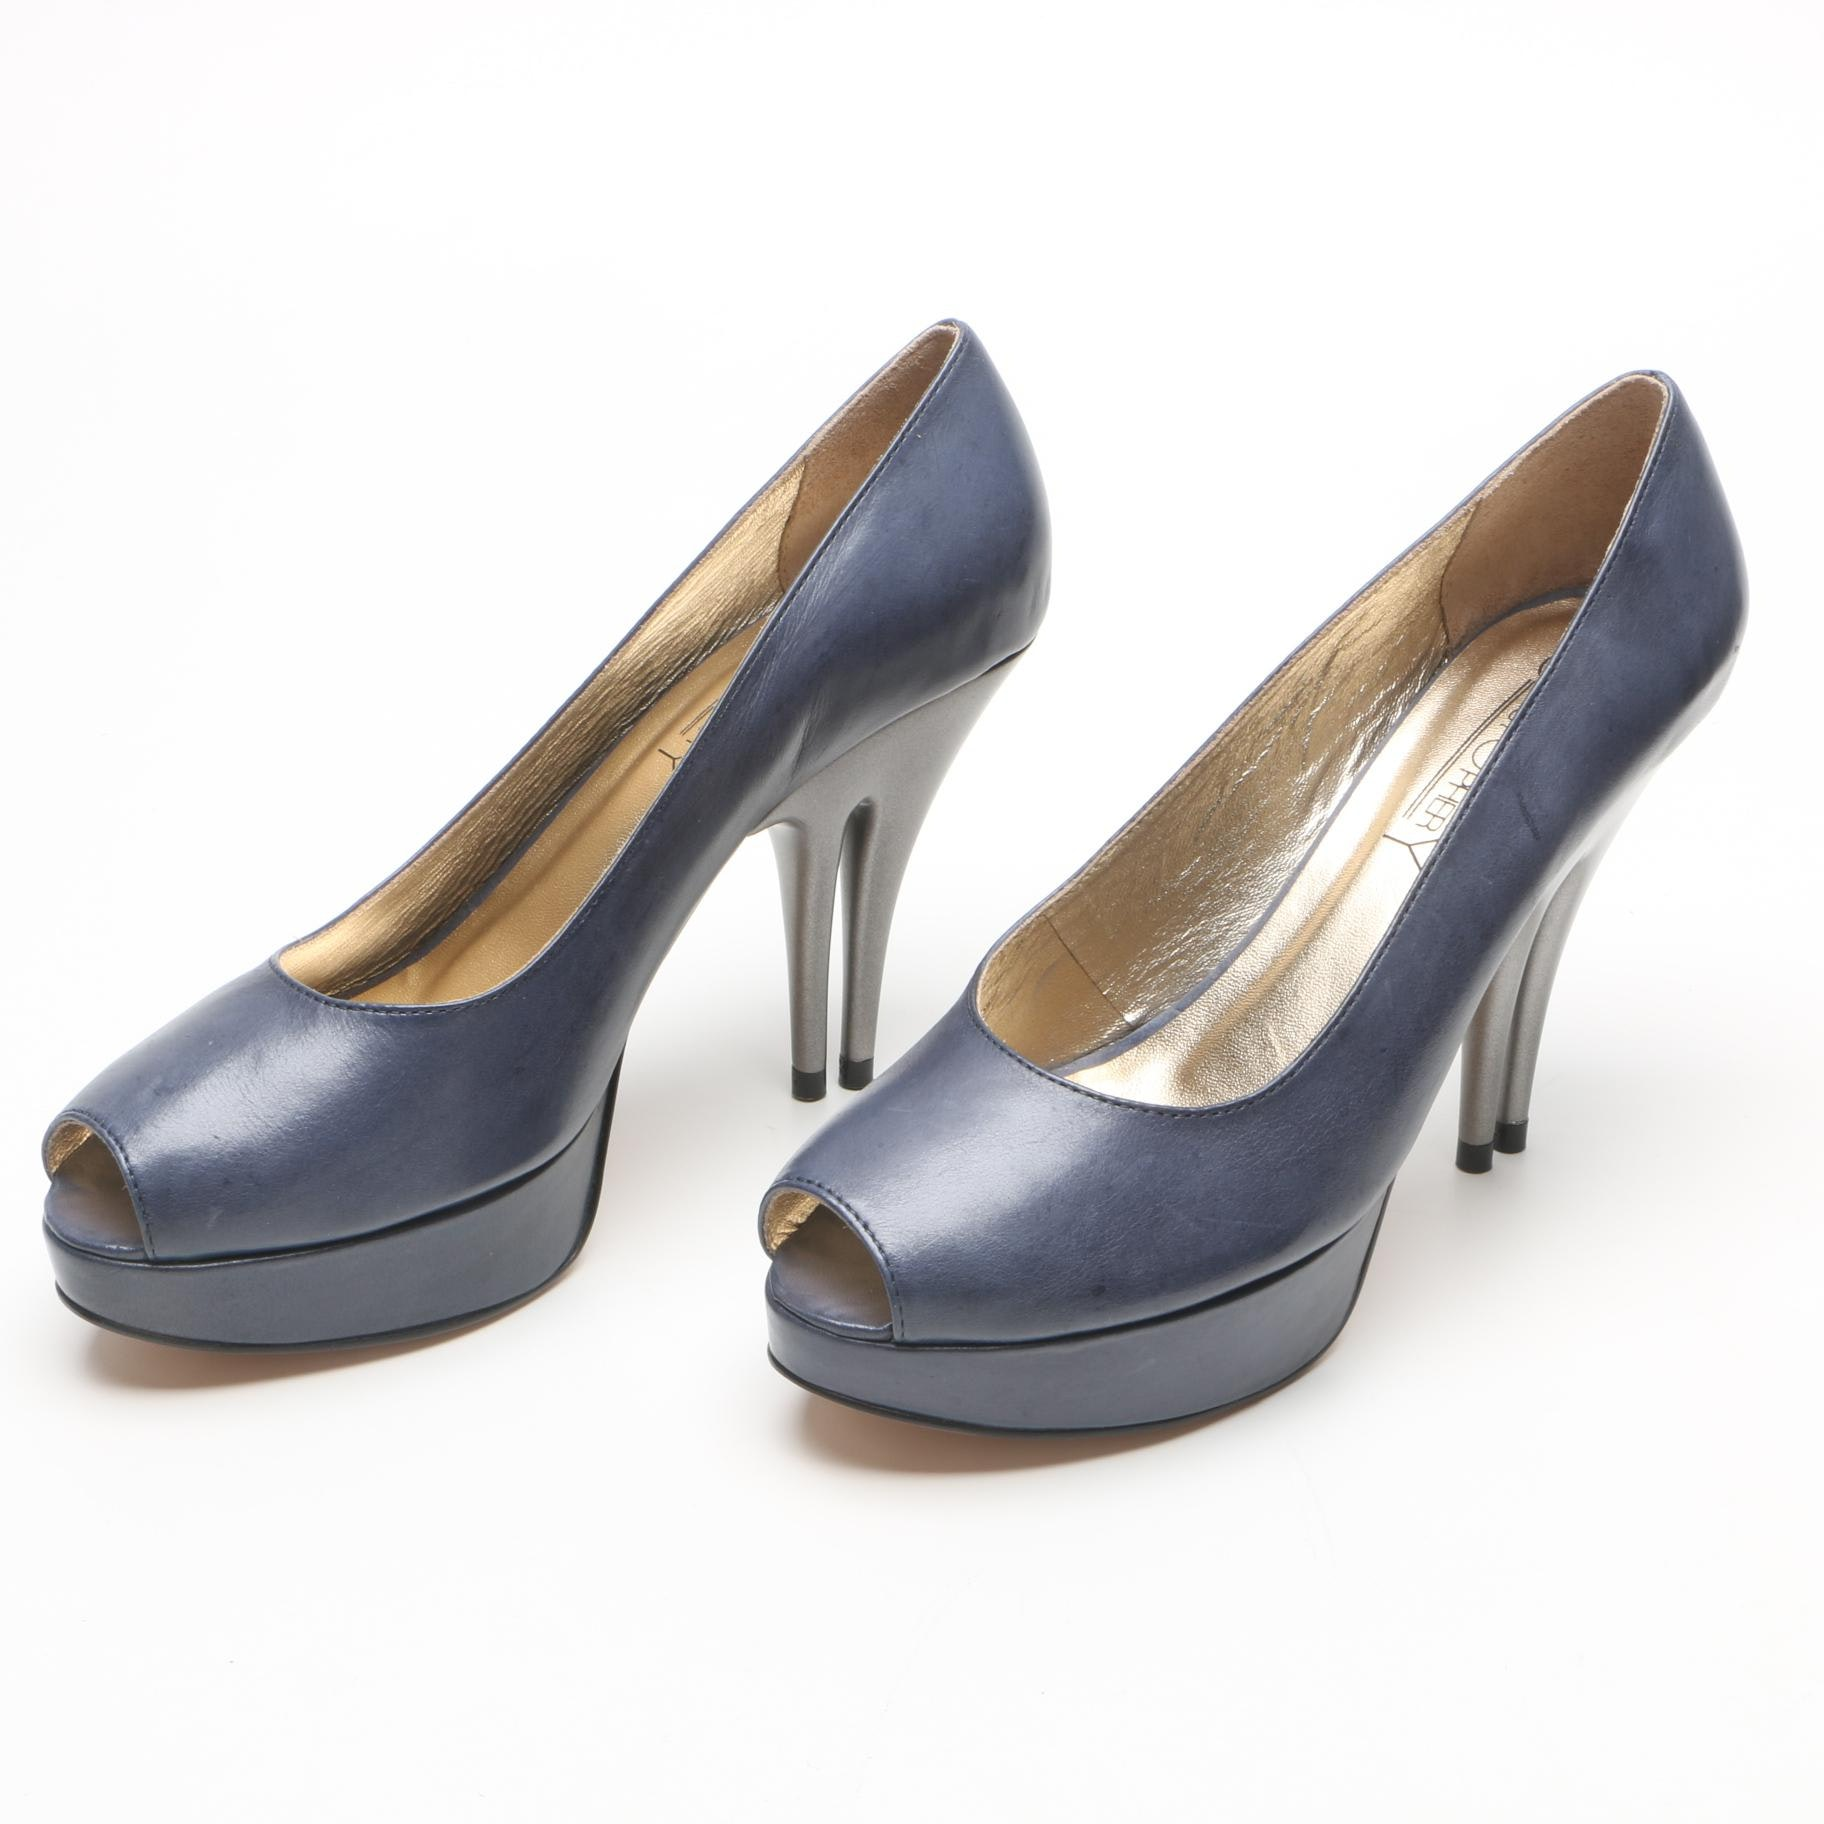 Christopher Coy Dual Heeled Blue Leather Peep-Toe Platform Pumps